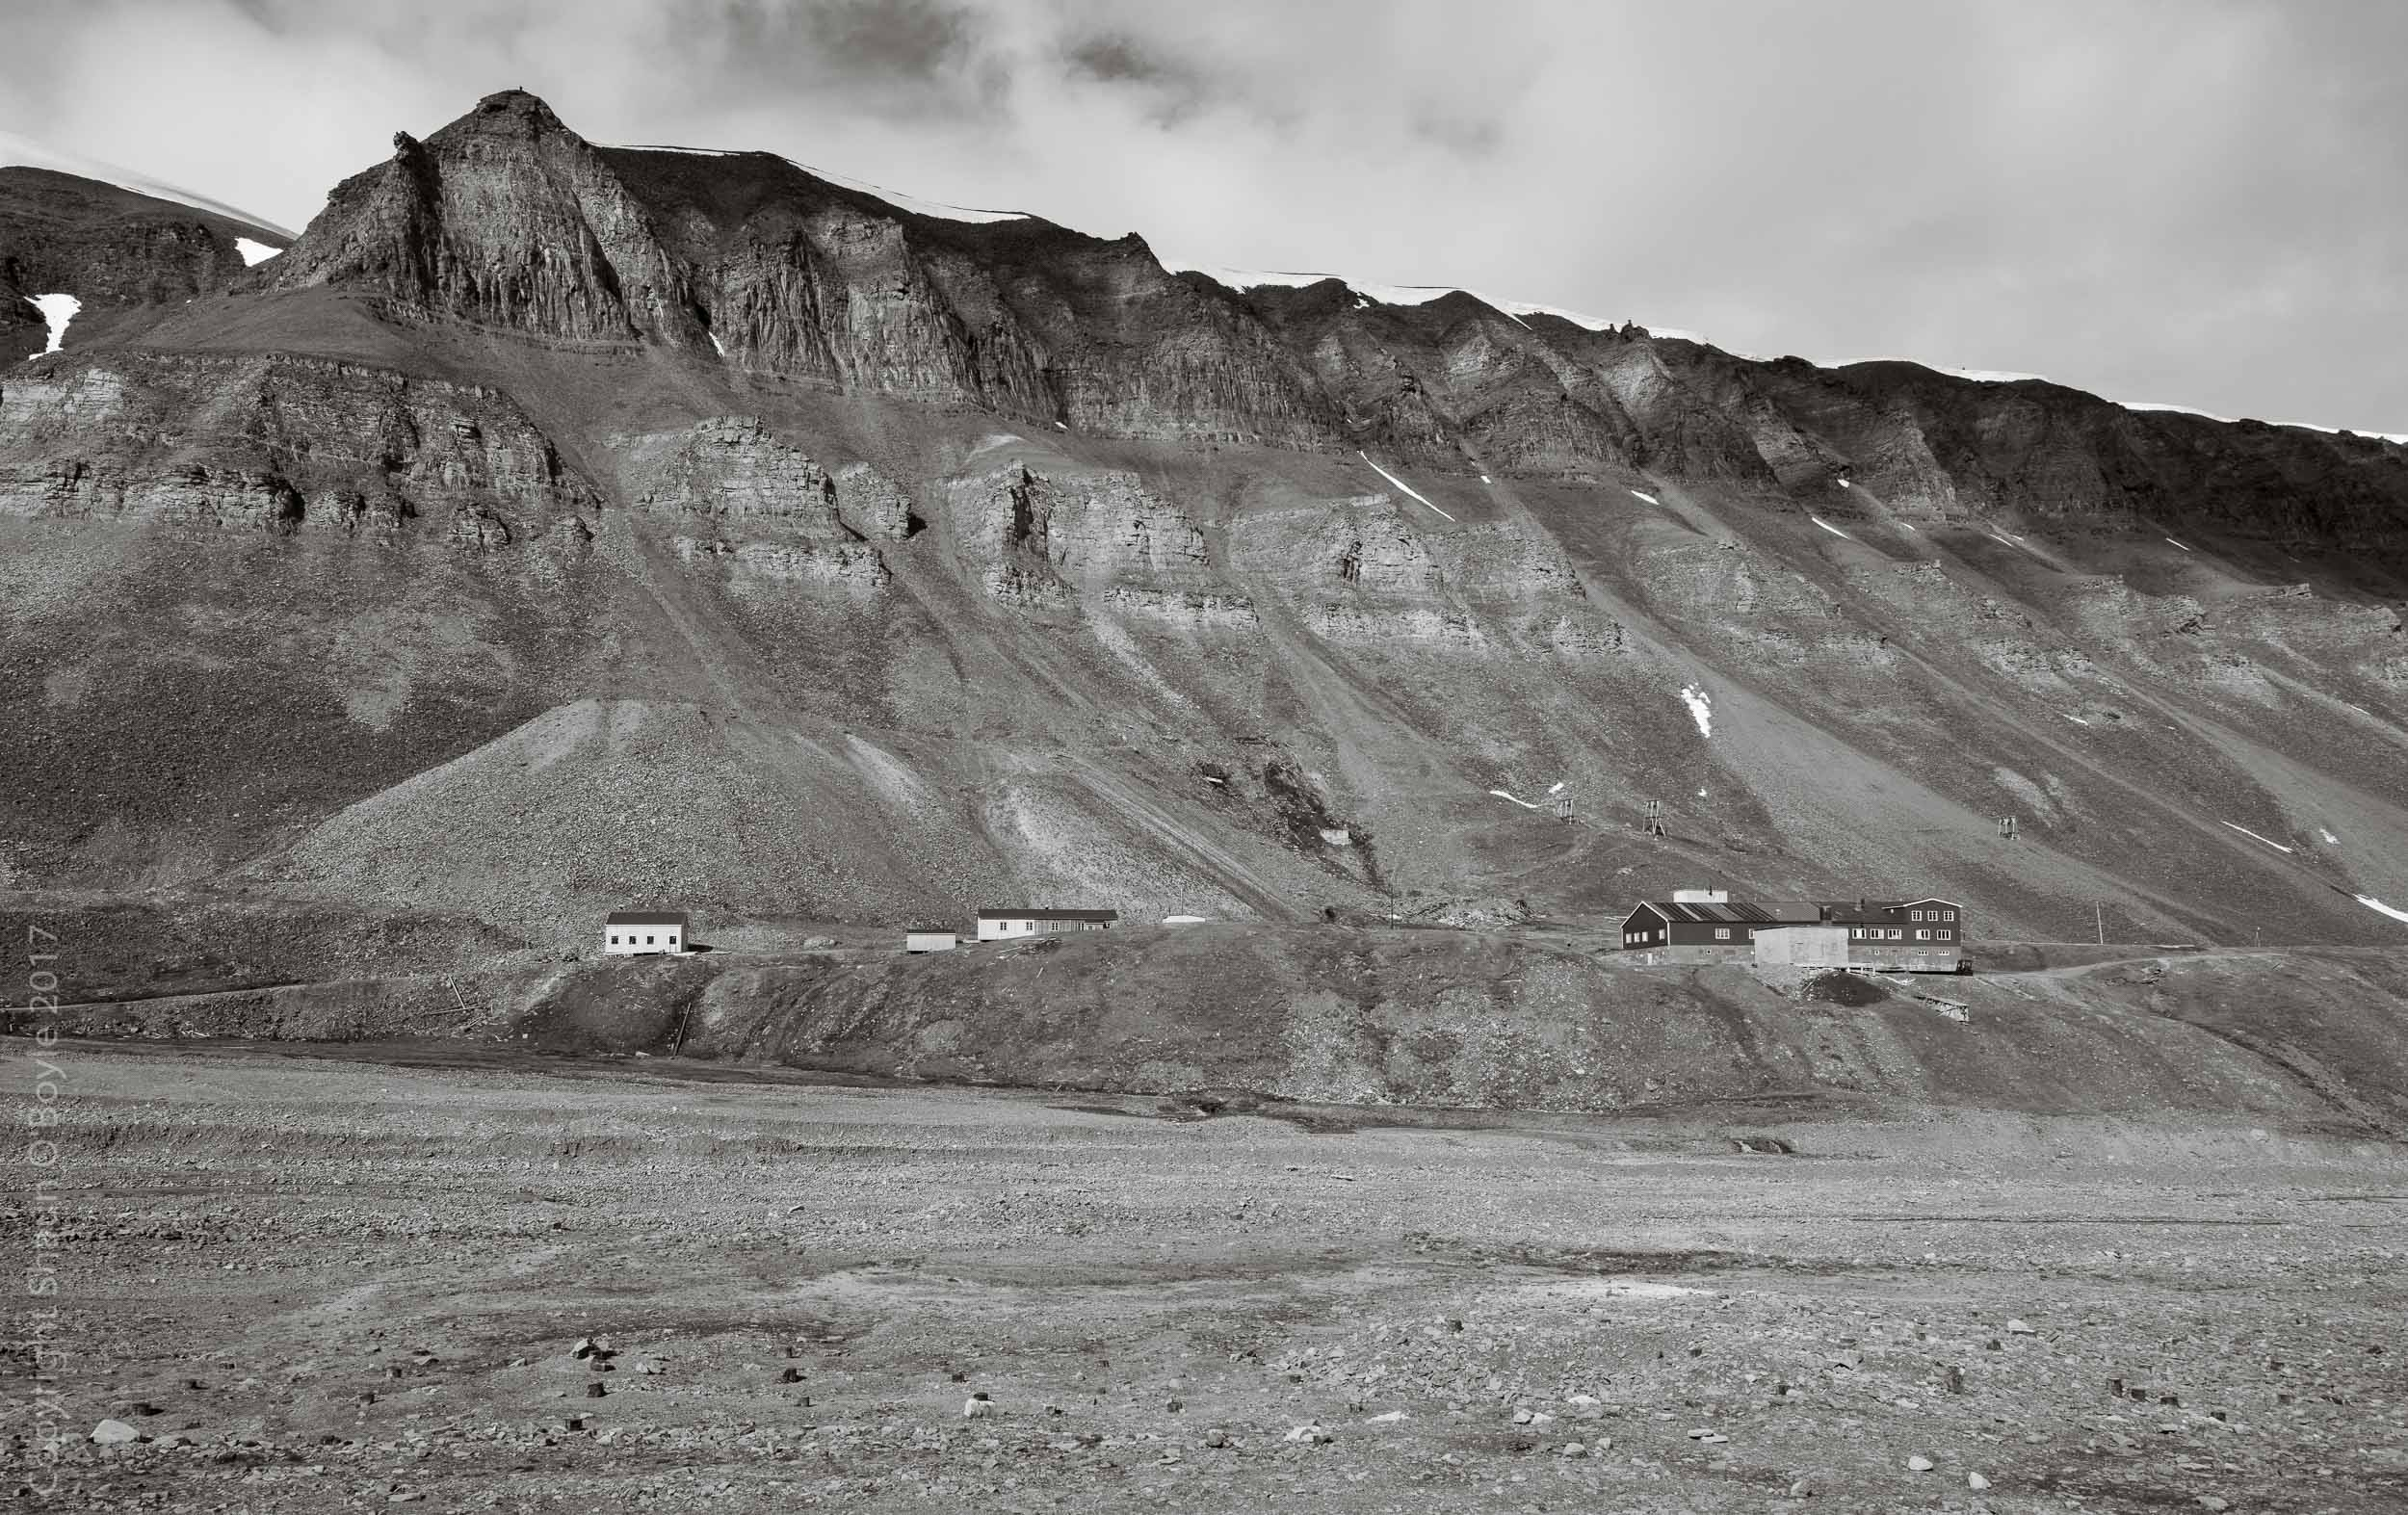 Sverdrupbyen